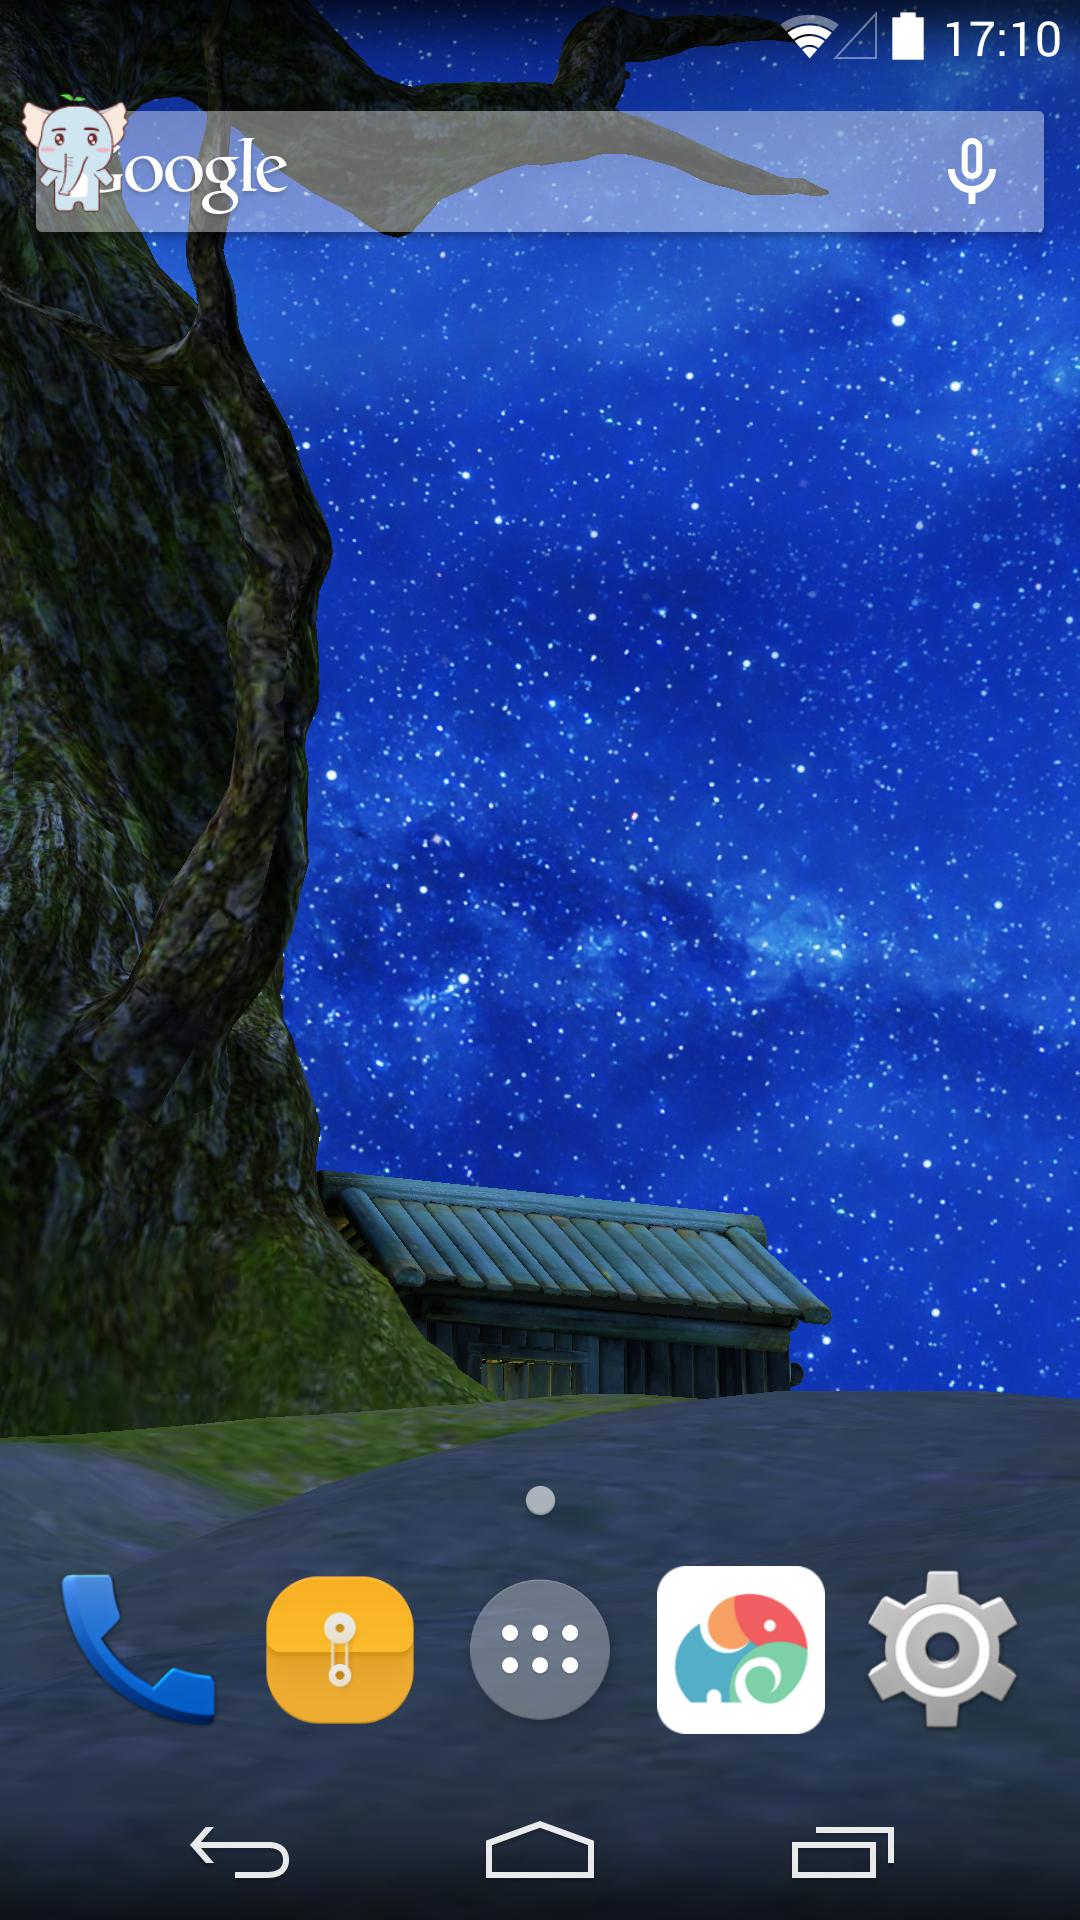 3D与星星作伴-梦象动态壁纸